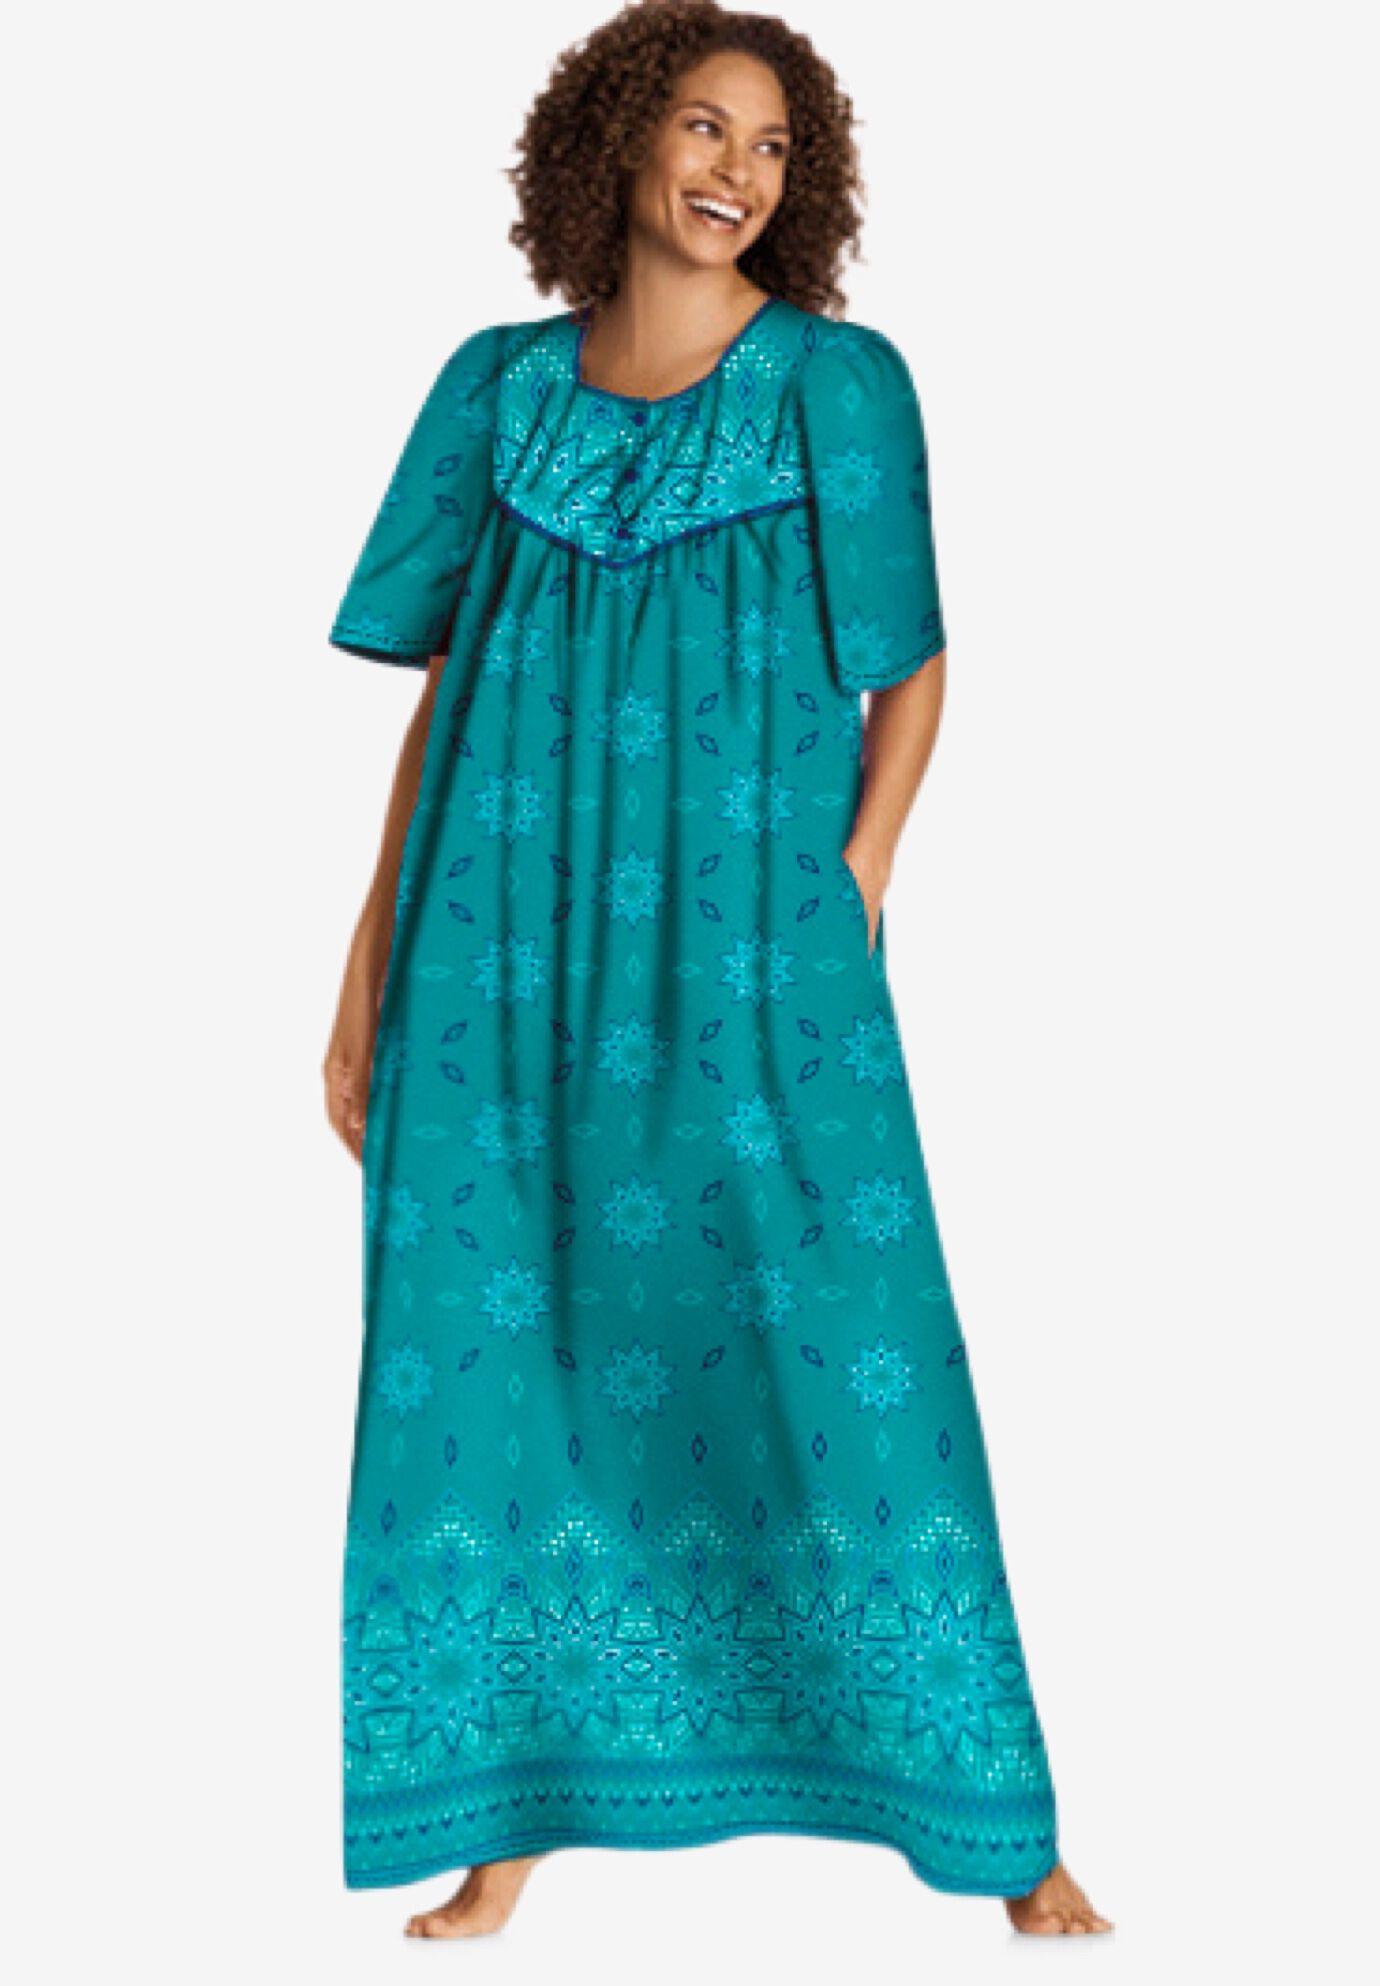 women s plus size lounge dresses roaman s